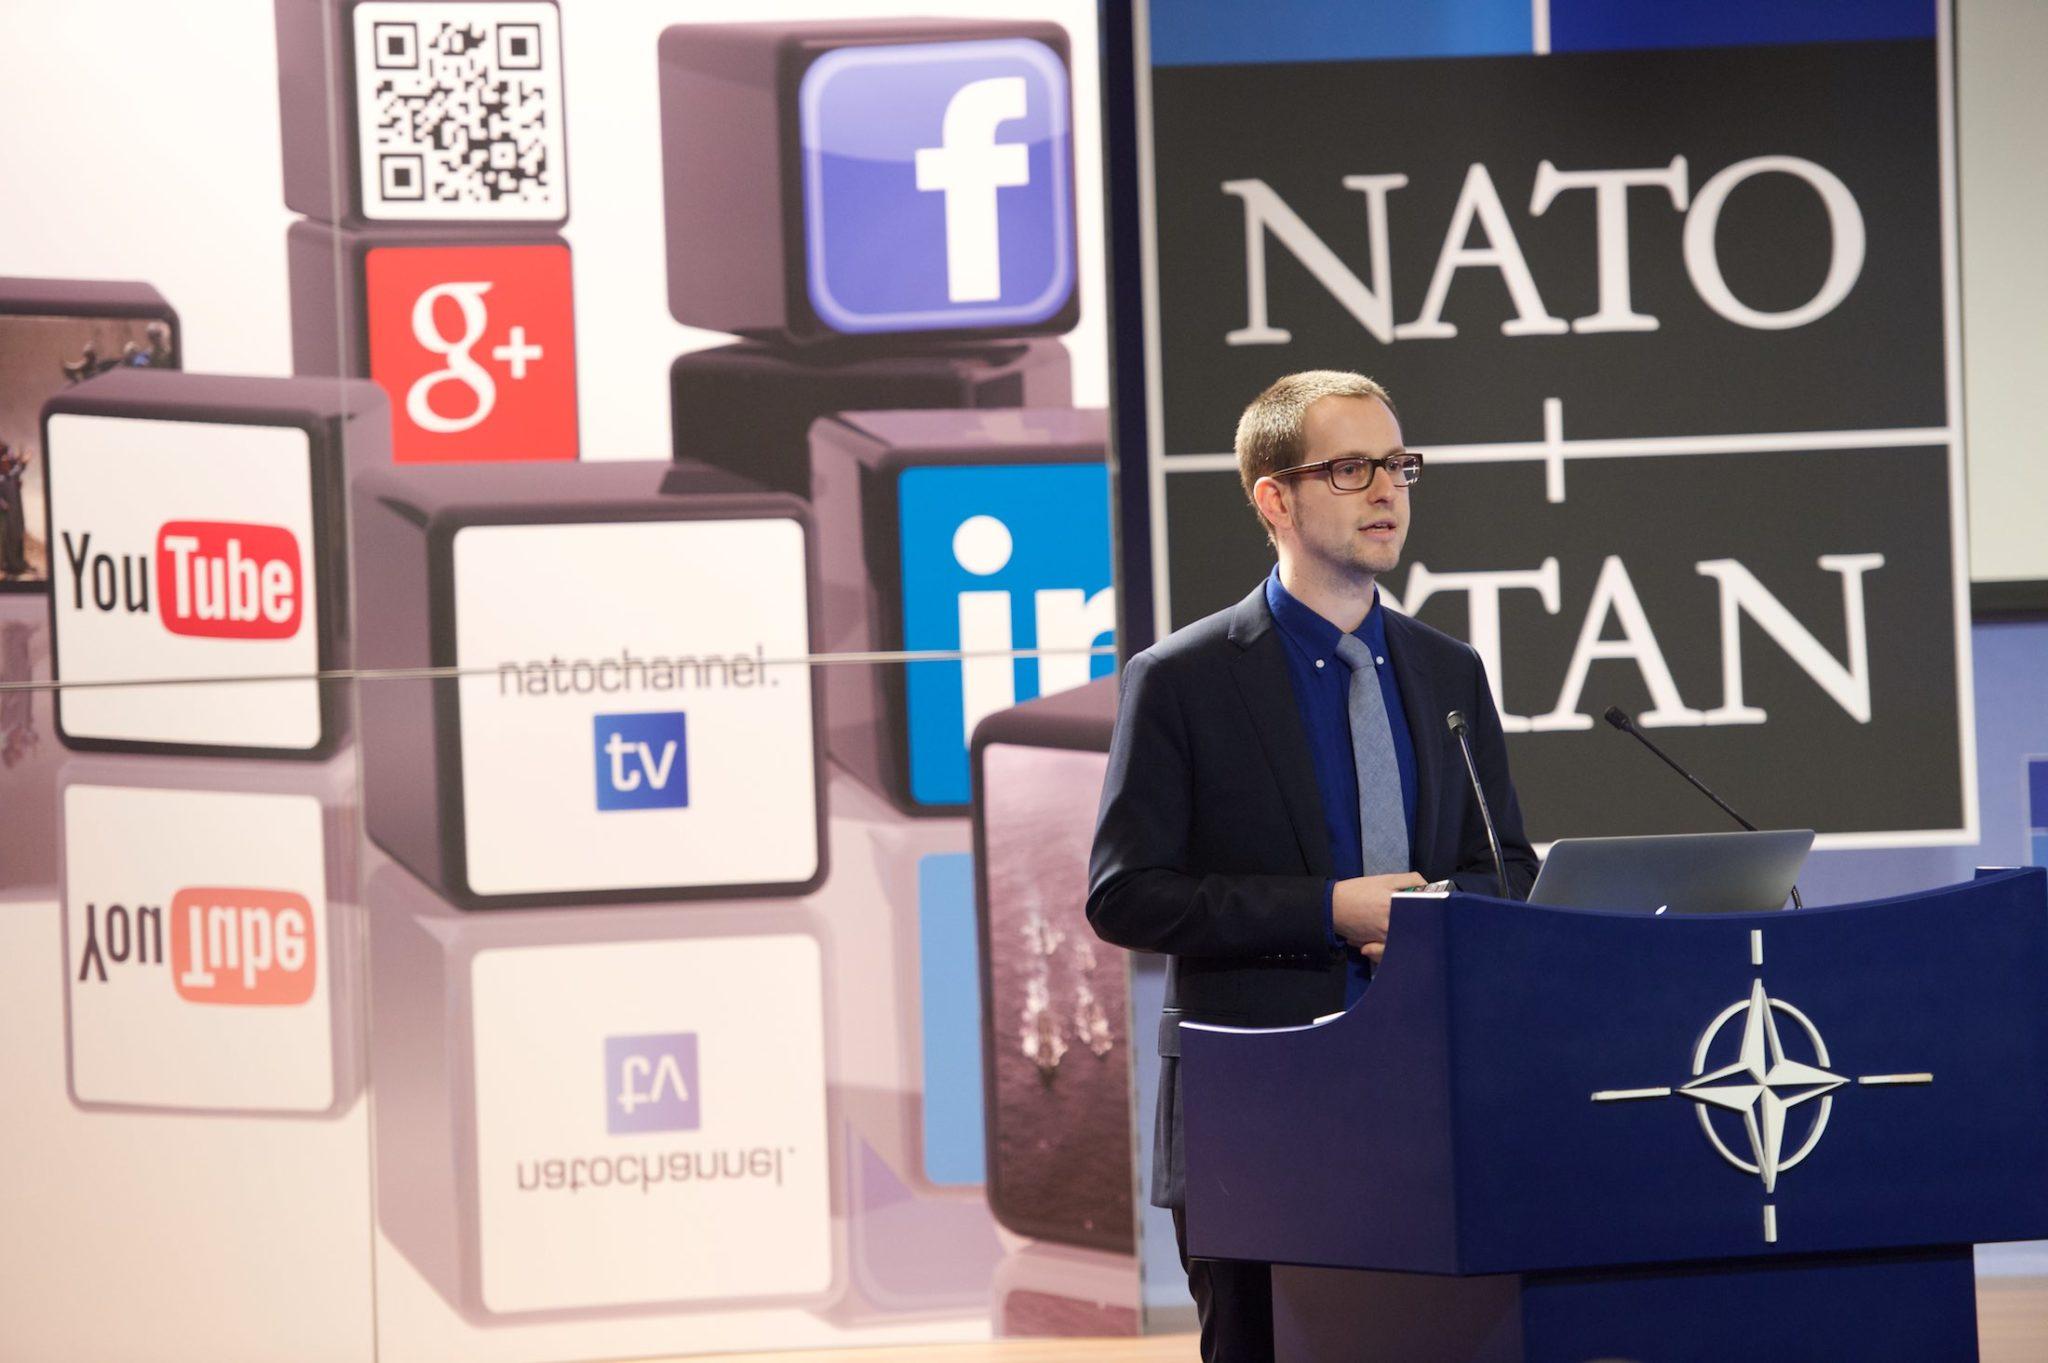 Brian Honigman speaking at NATO